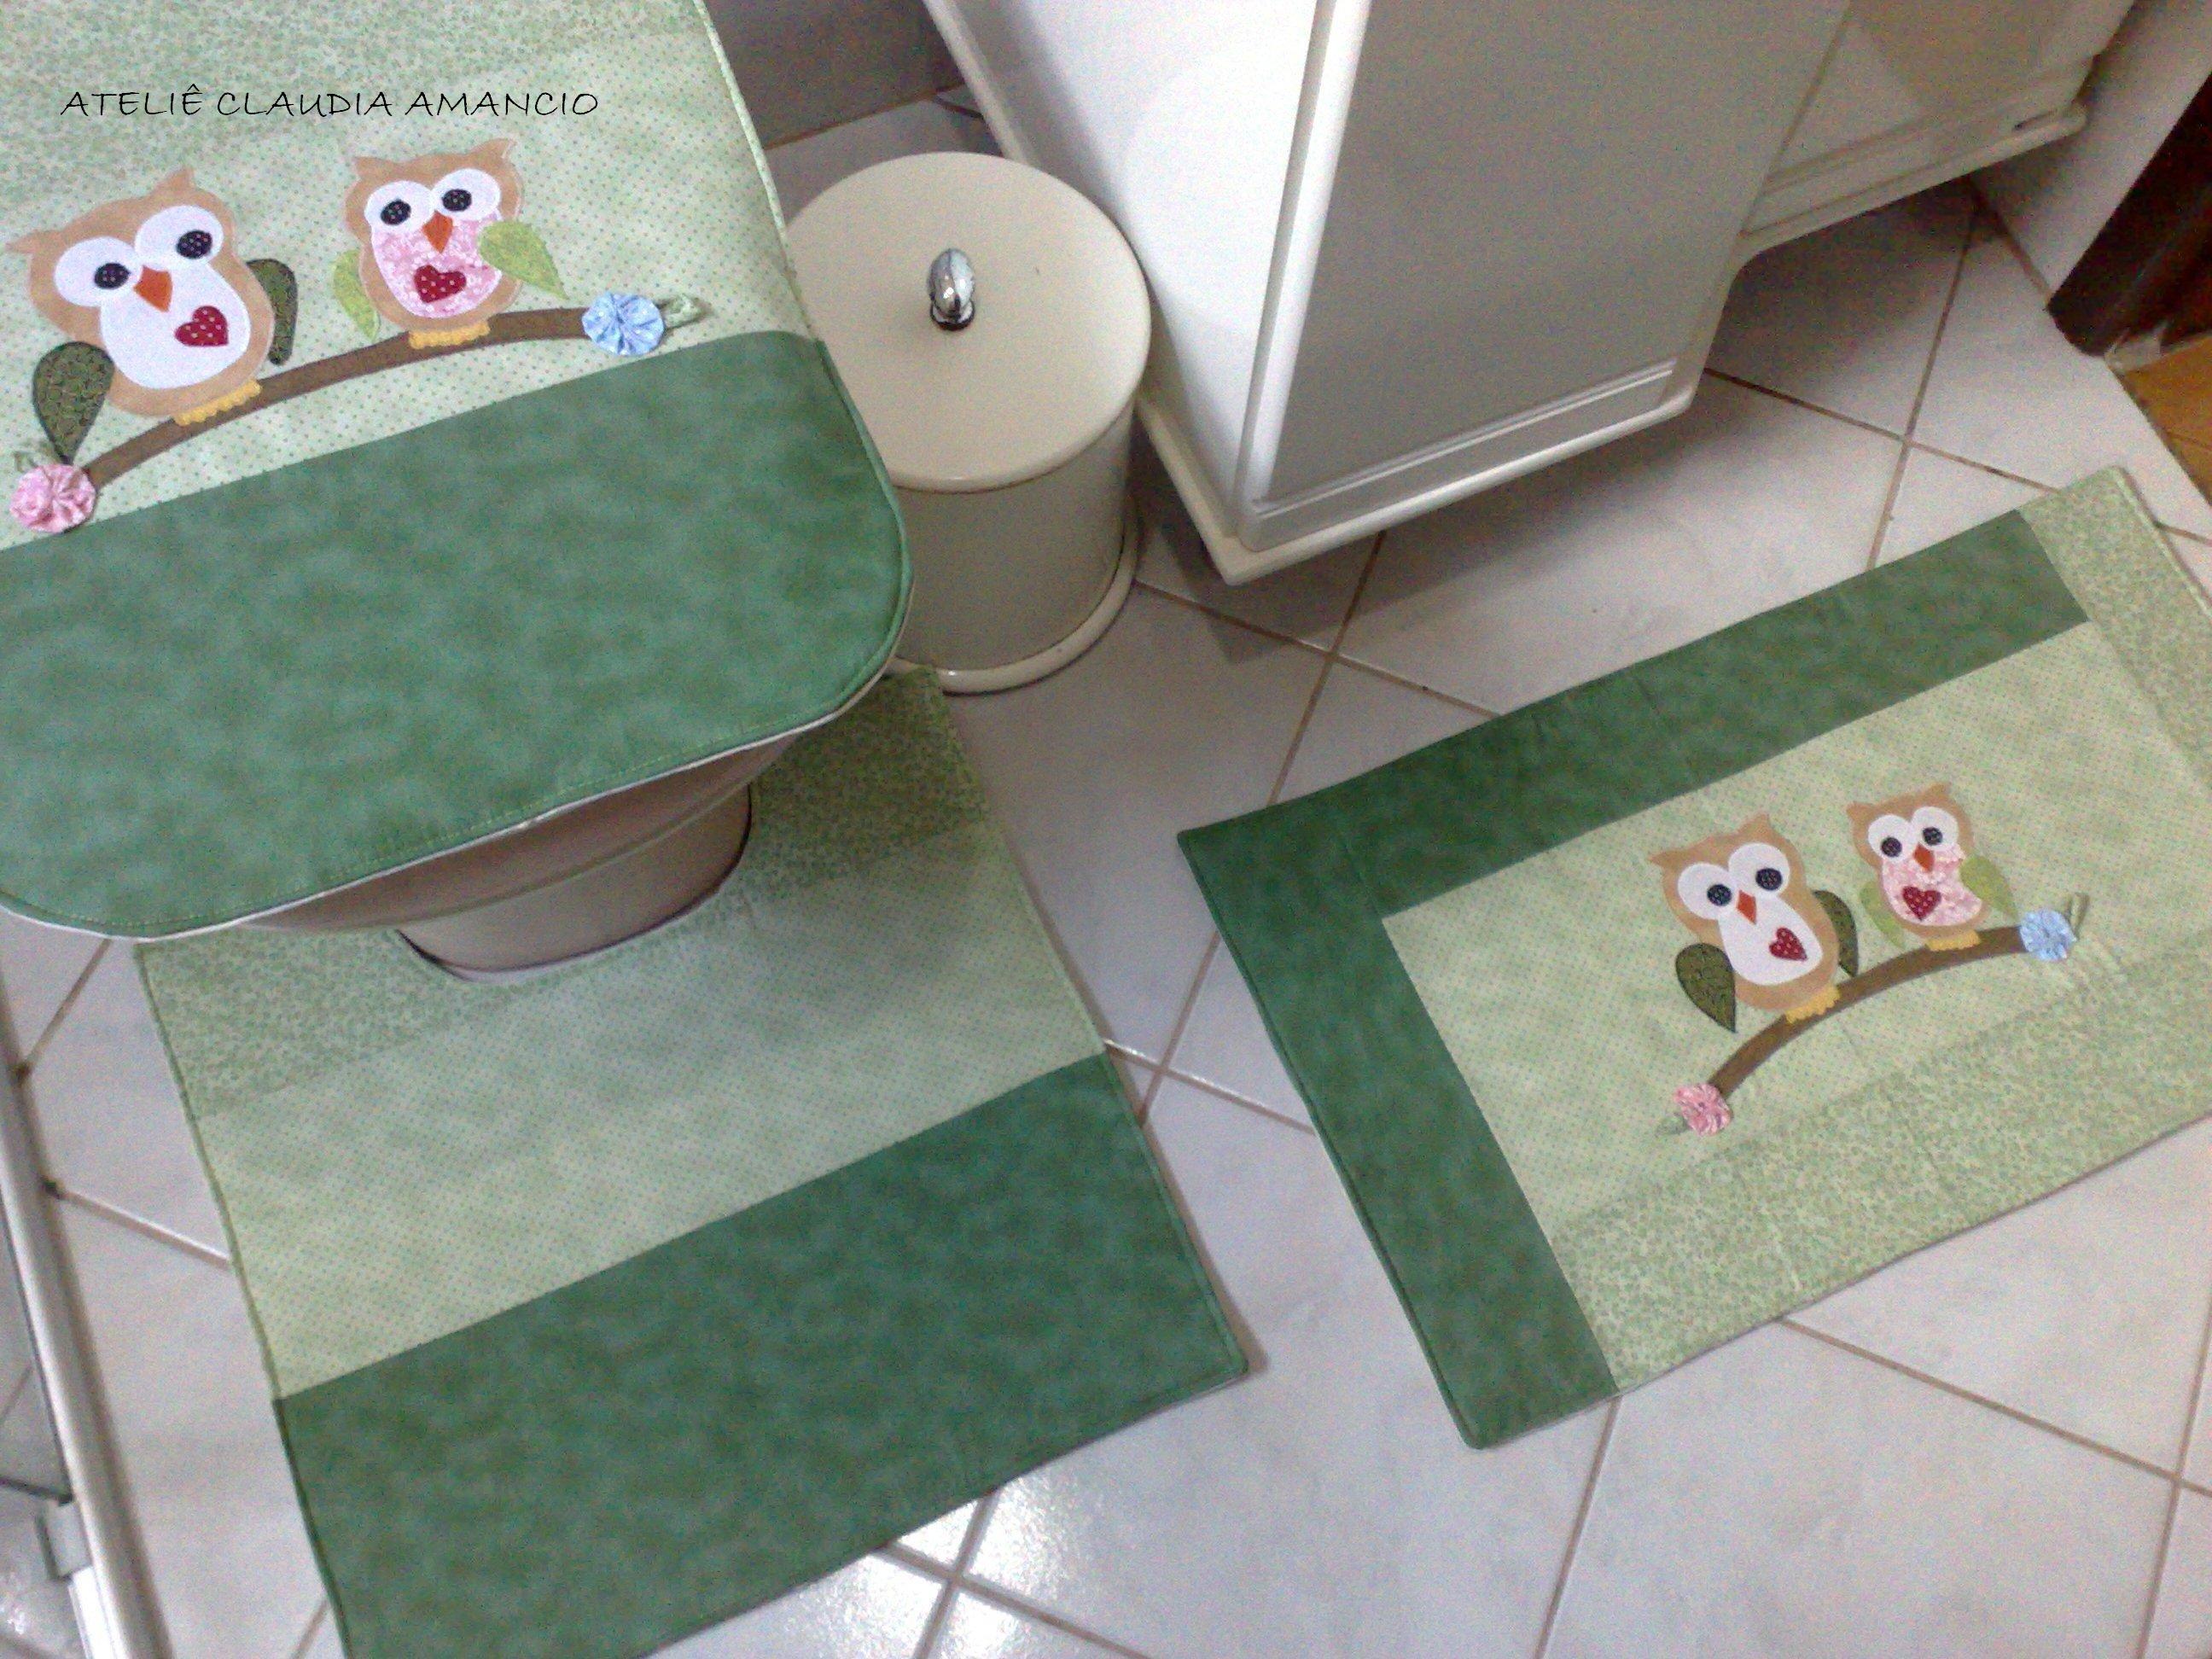 de banheiro jogos: de banheiro tapete coruja jogo tapetes de banheiro  #614C41 2592x1944 Banheiro Azul